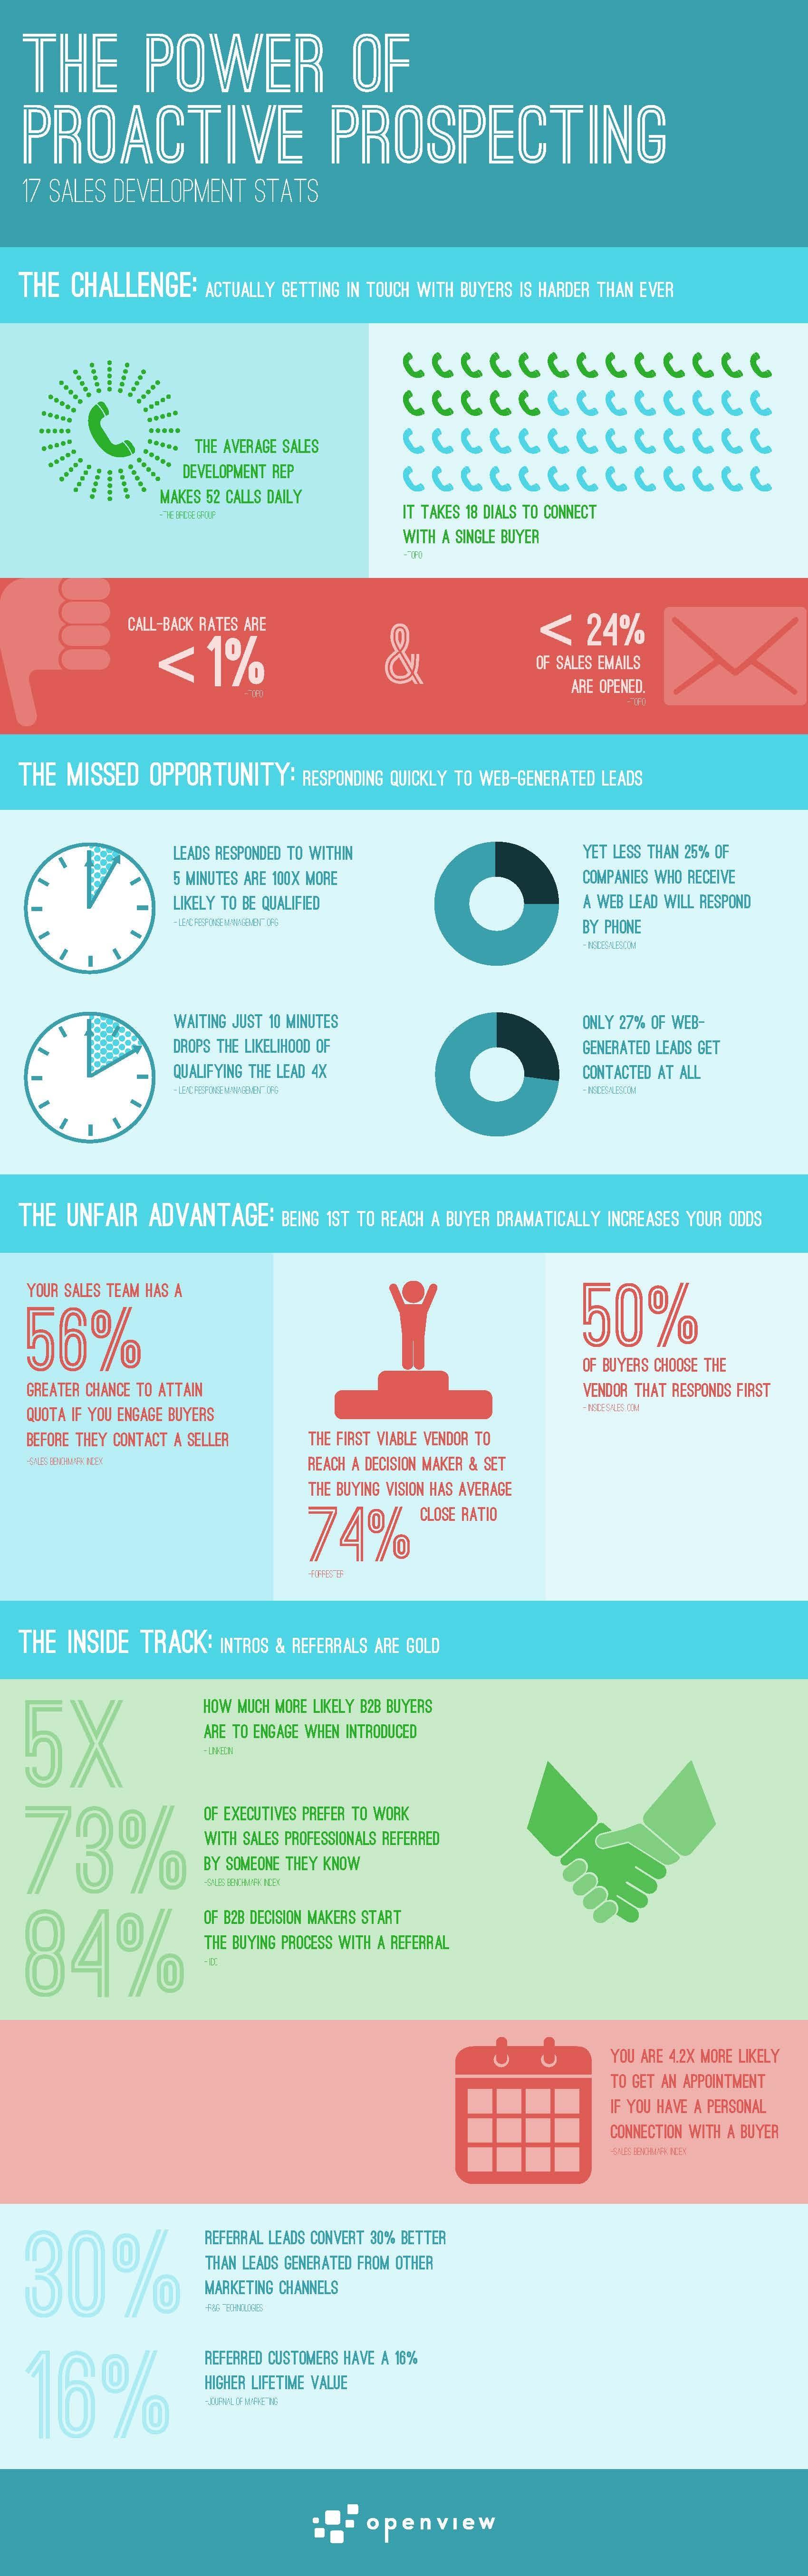 power-of-proactive-prospecting-infographic